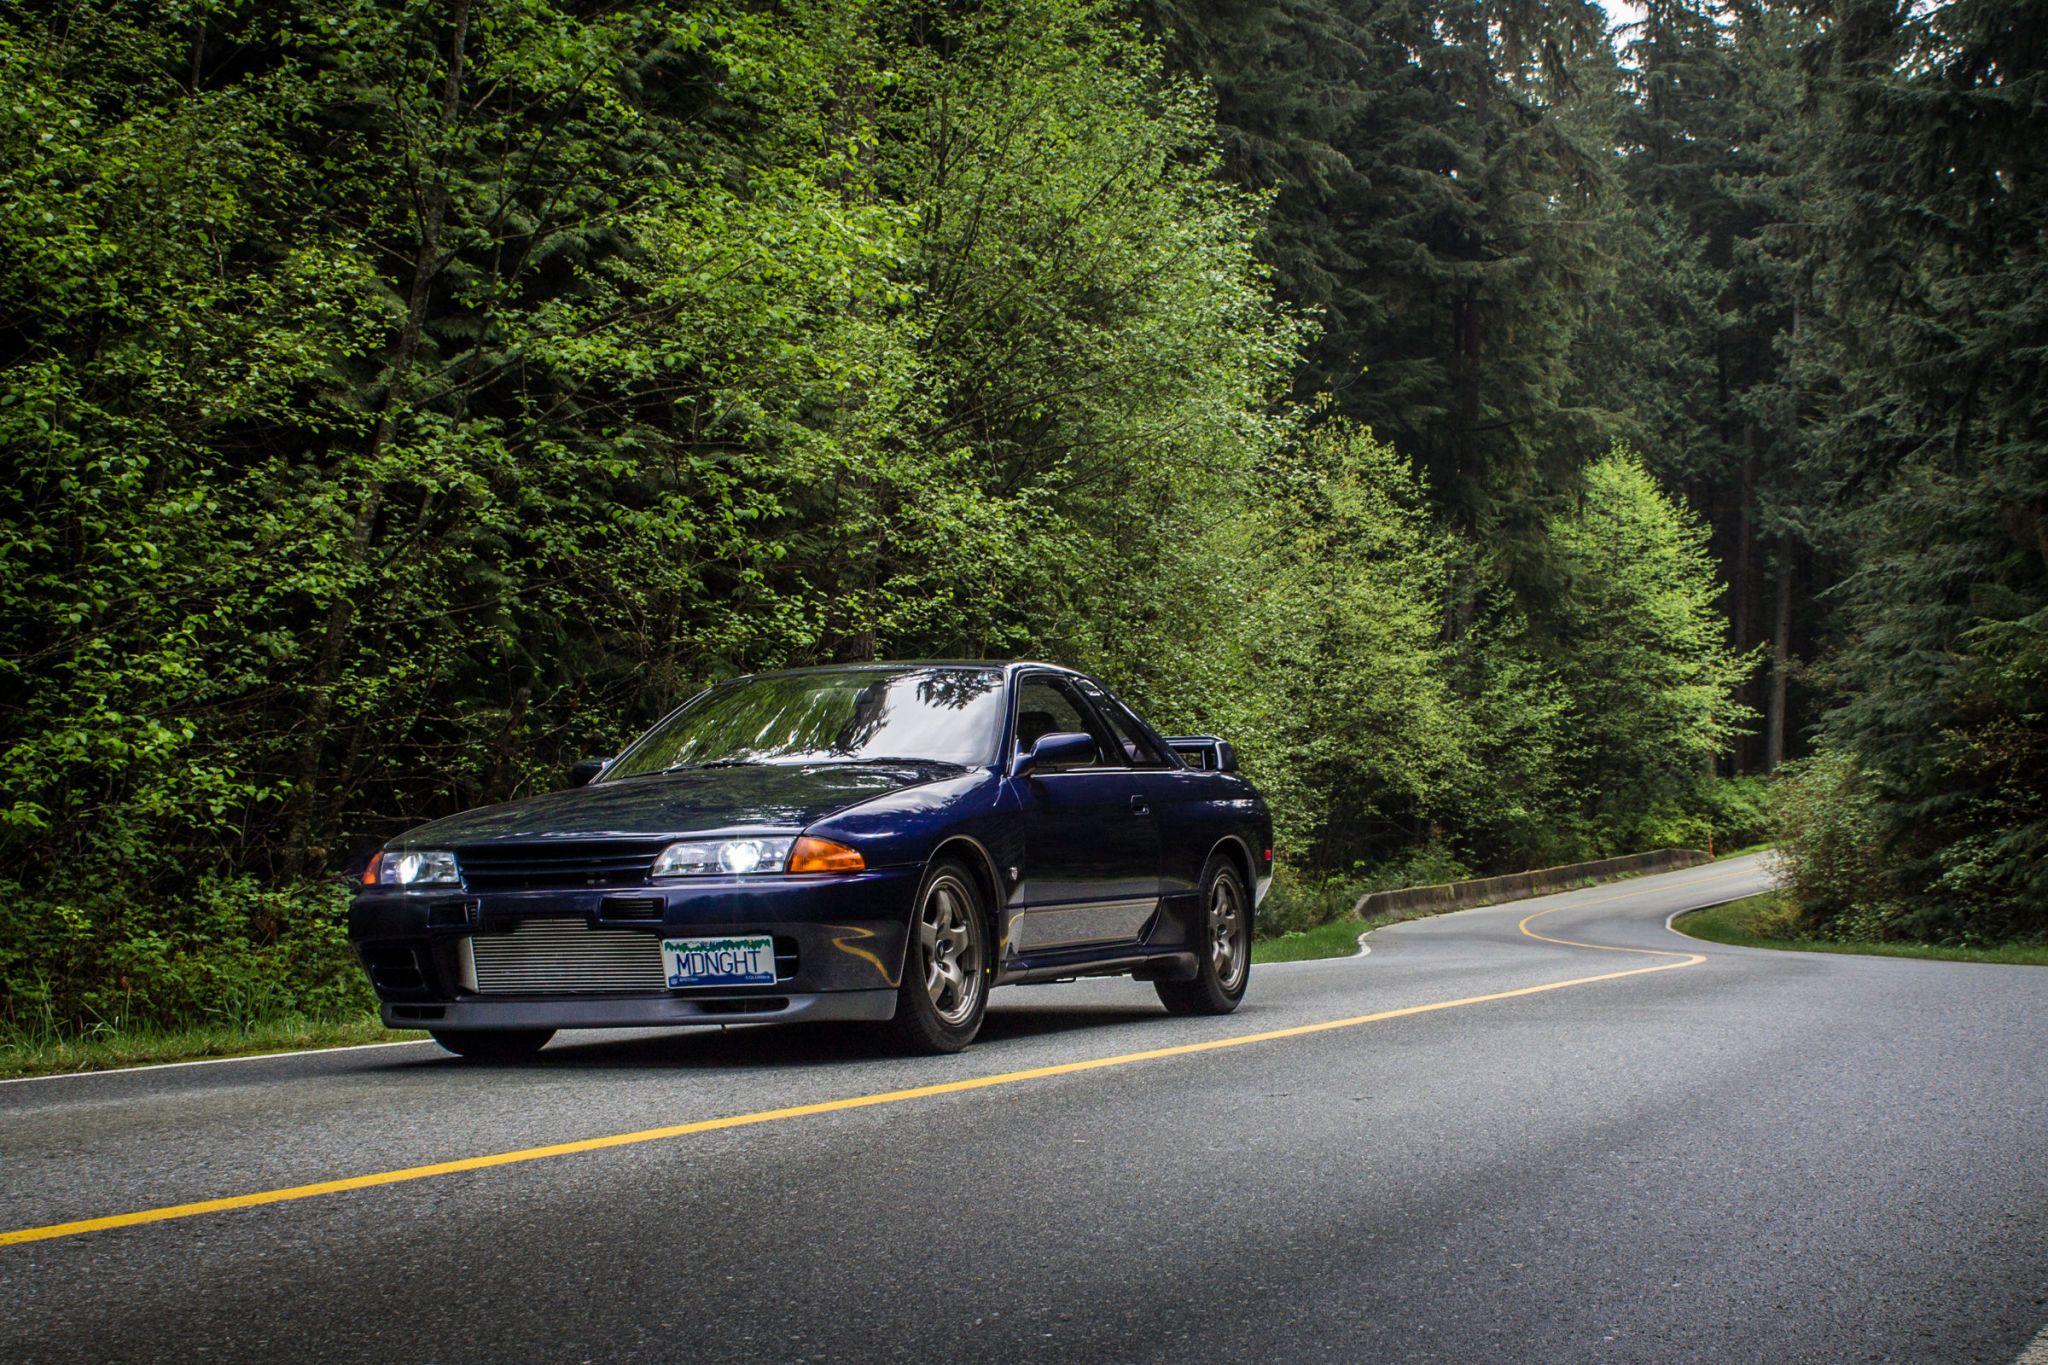 Nissan 2/5 BNR34 Nissan Skyline GT-R Hot Wheels 2019